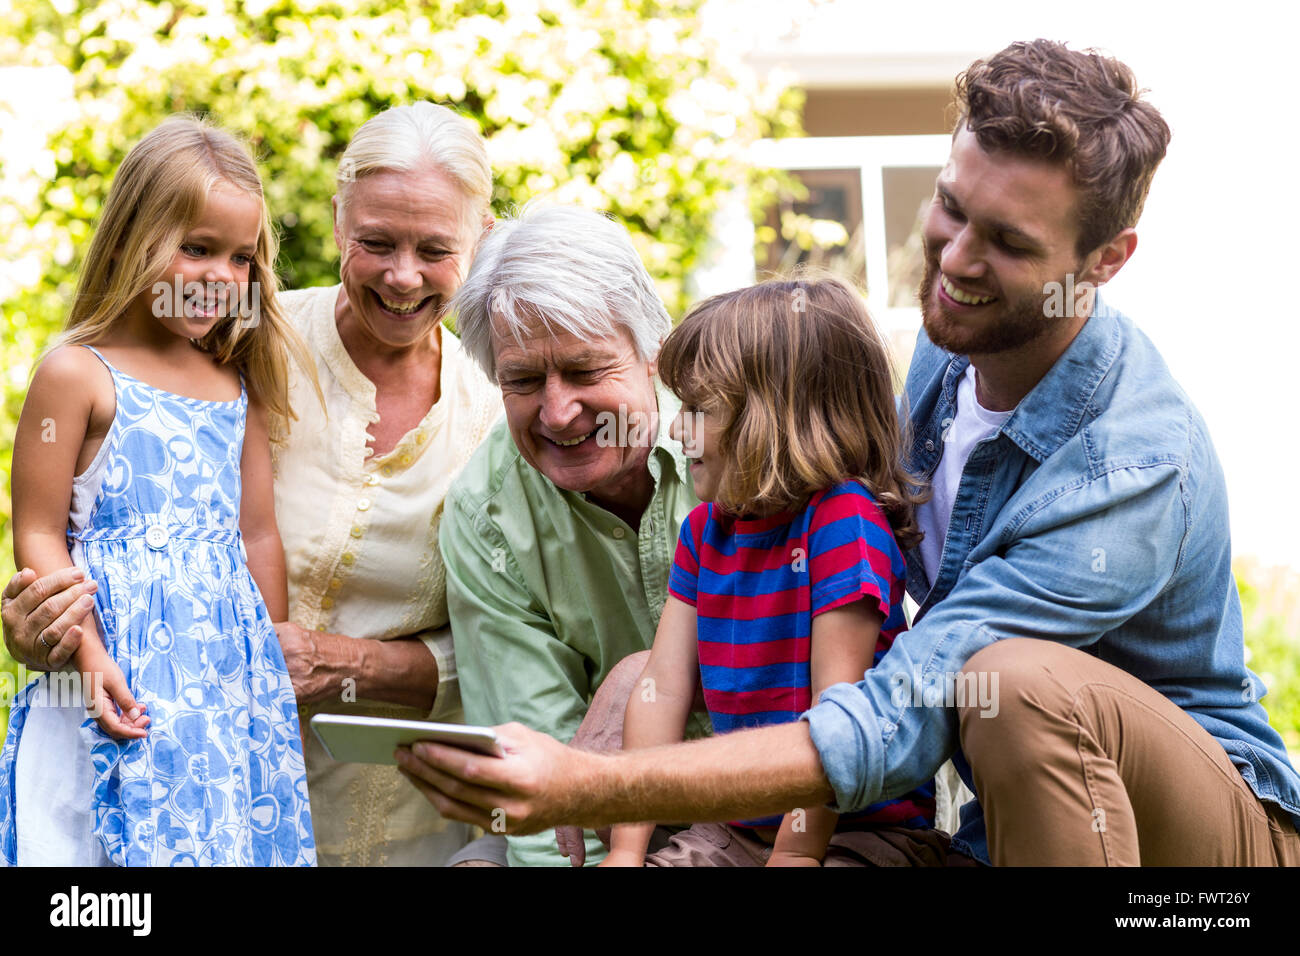 Smiling père prenant en famille selfies Photo Stock